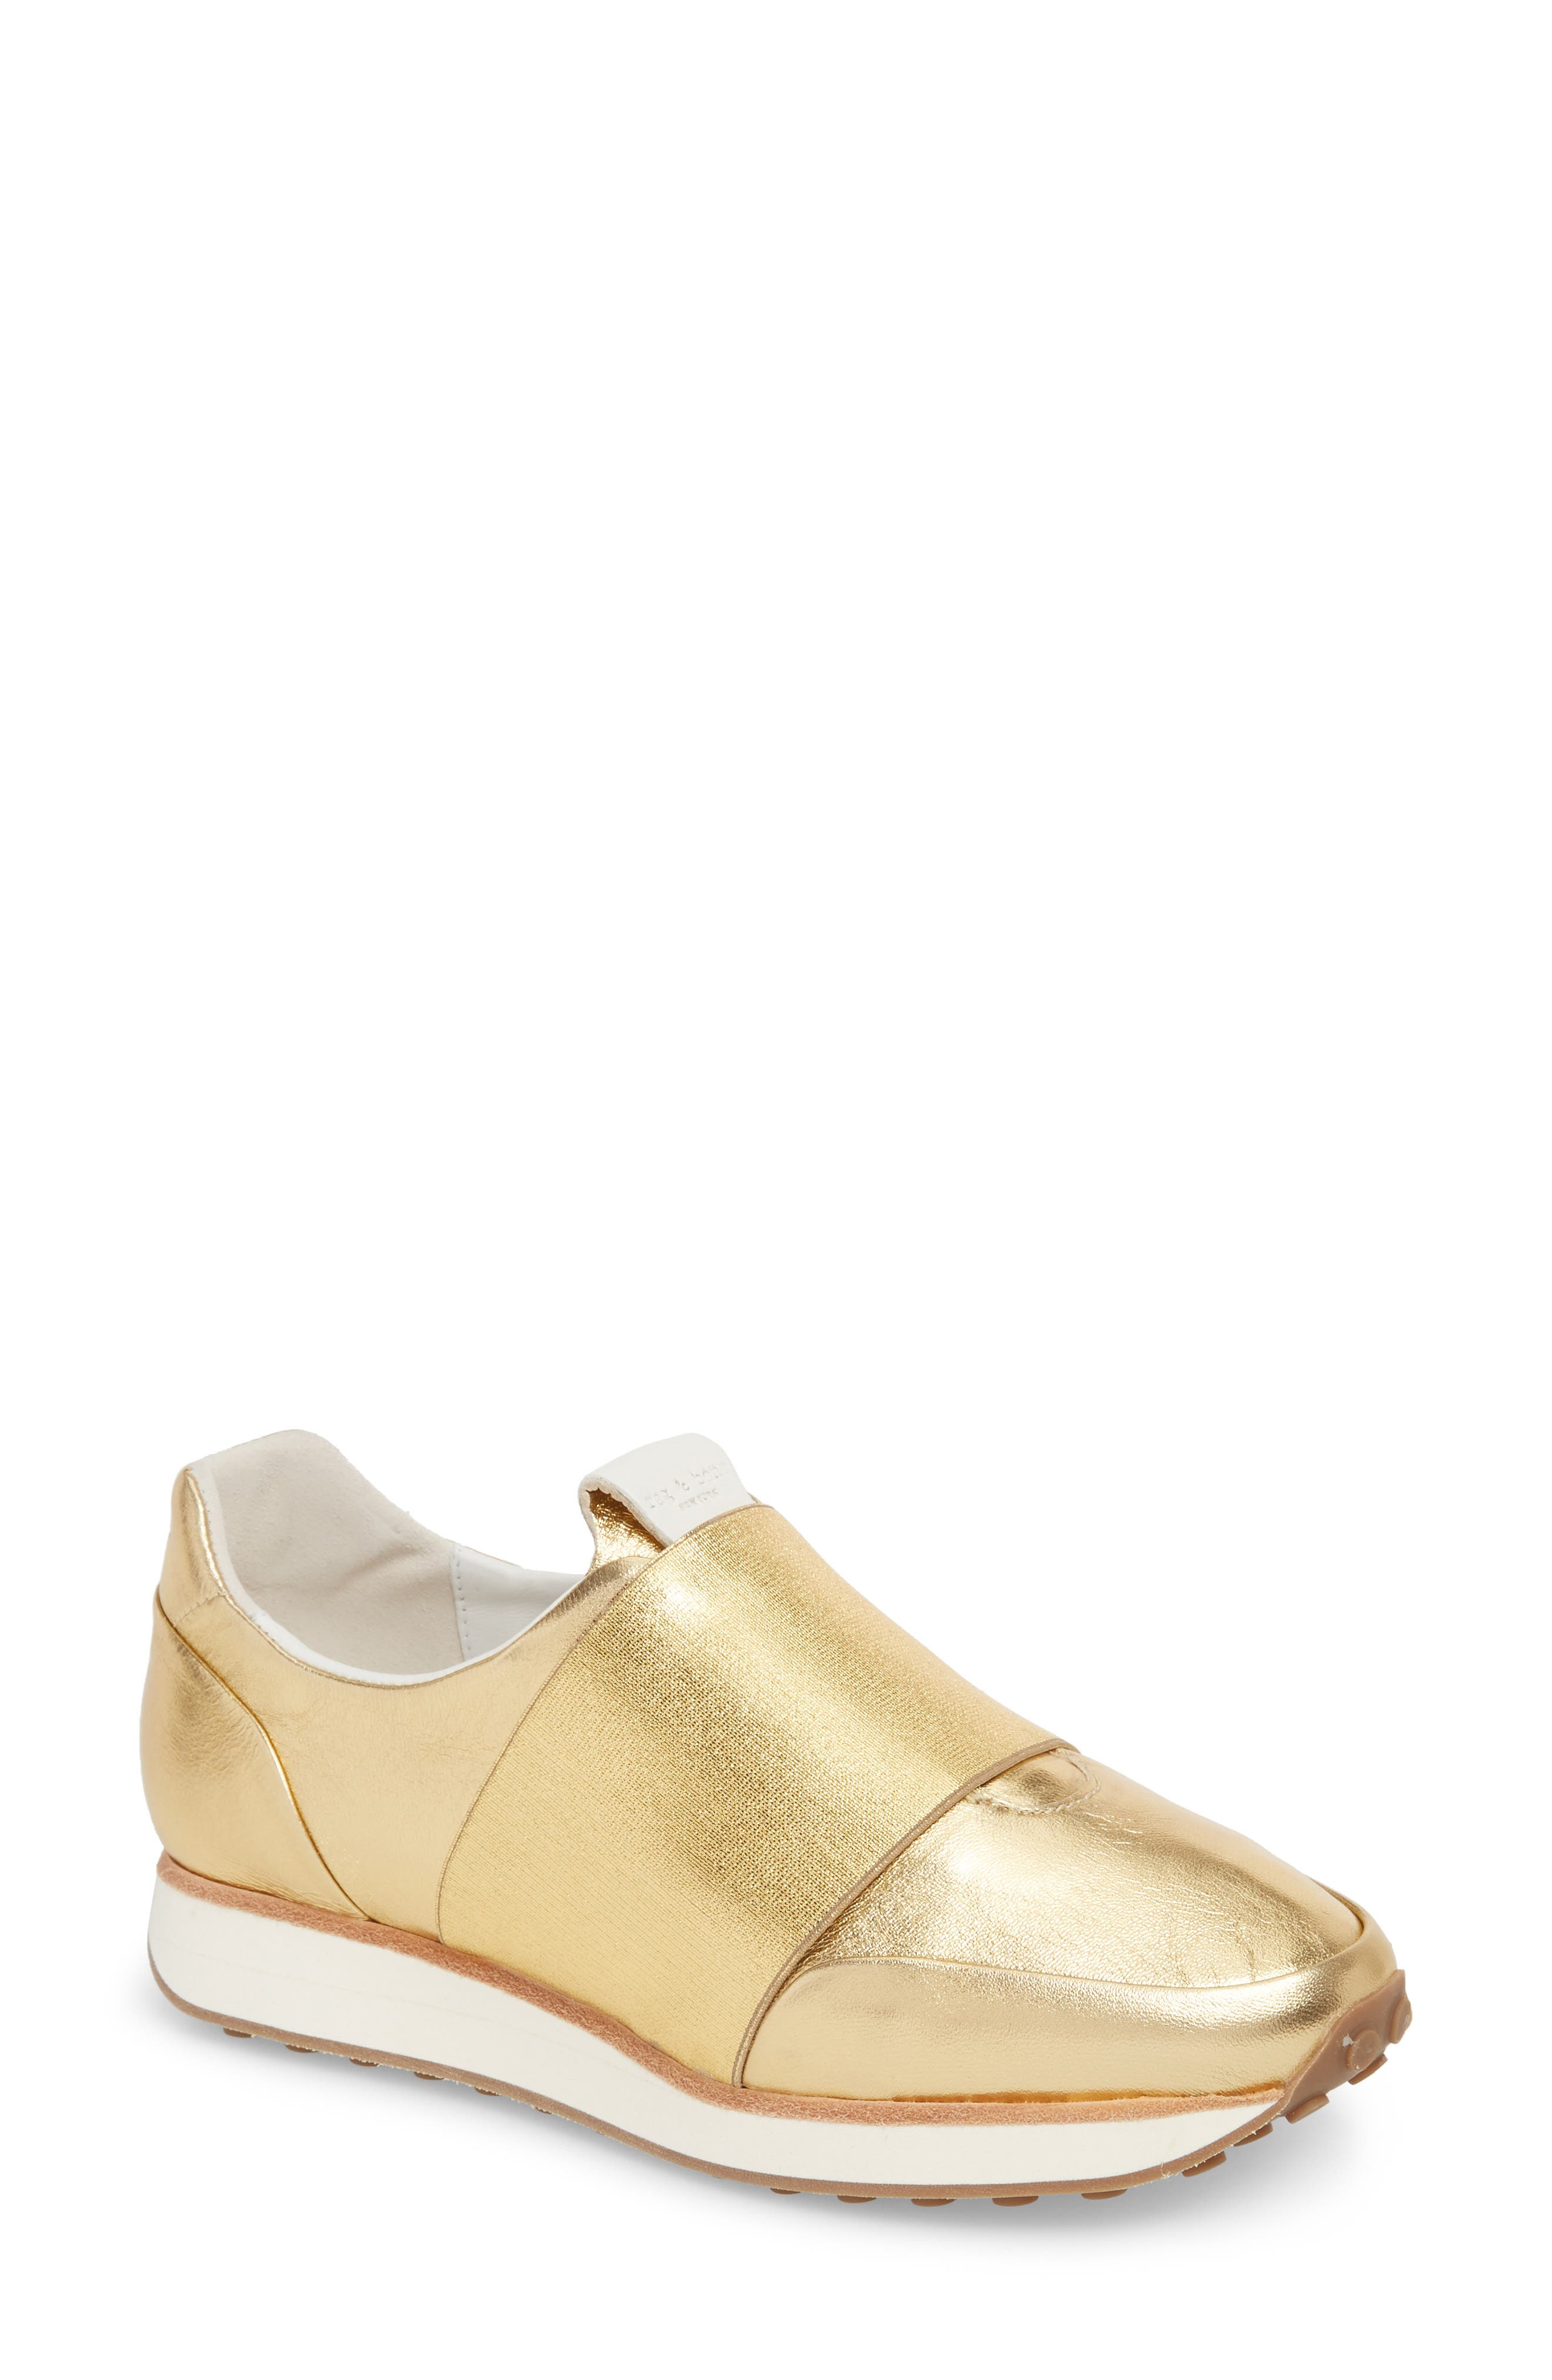 Dylan Sneaker,                             Main thumbnail 1, color,                             Gold